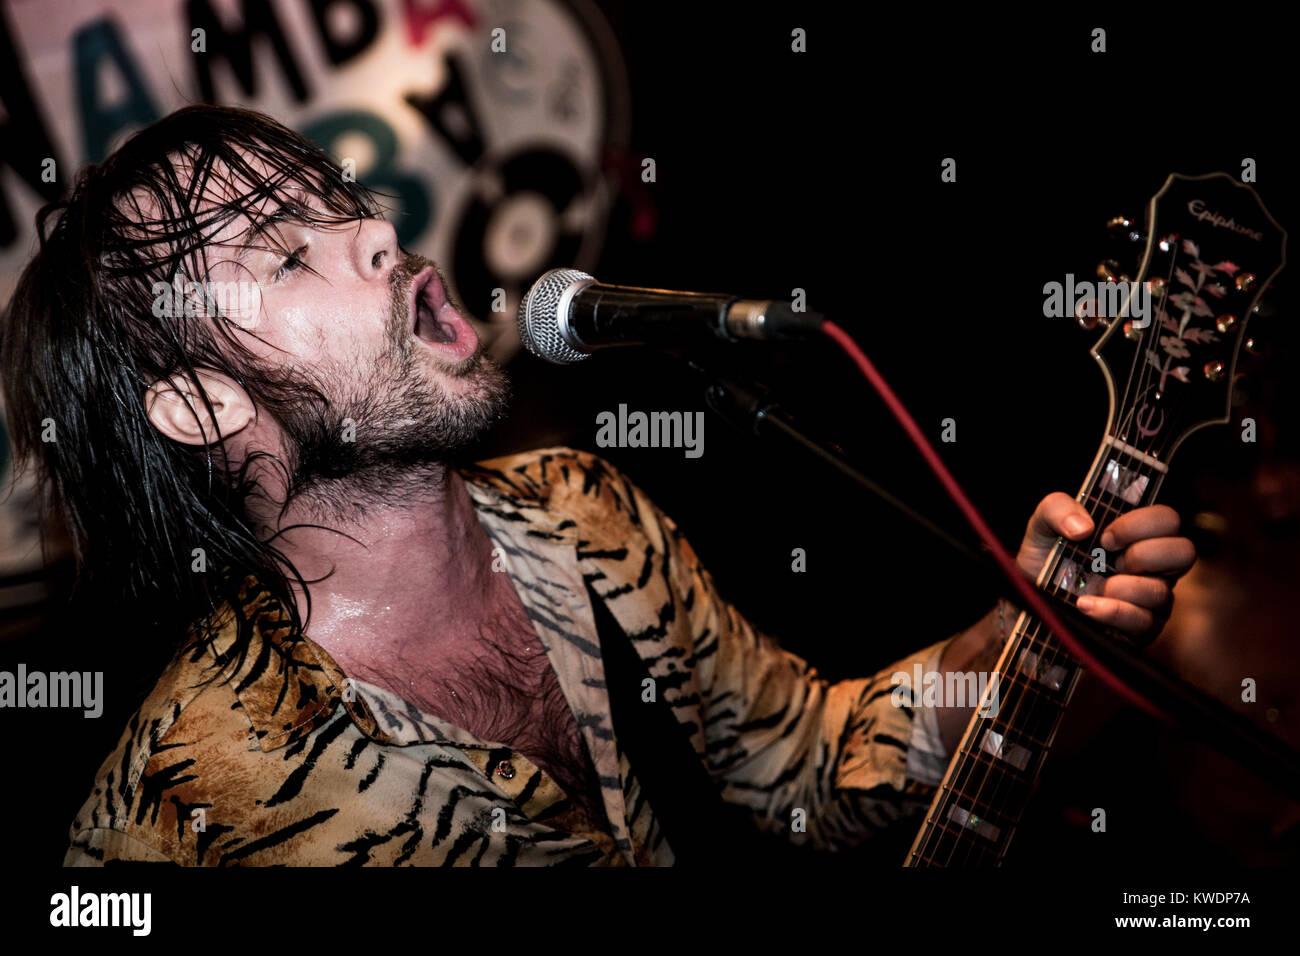 Barcelona, Spain. October 05, 2017. Concert by Los Bengala in Marula Café. Organized by A Wamba Buluba. Photographer: - Stock Image